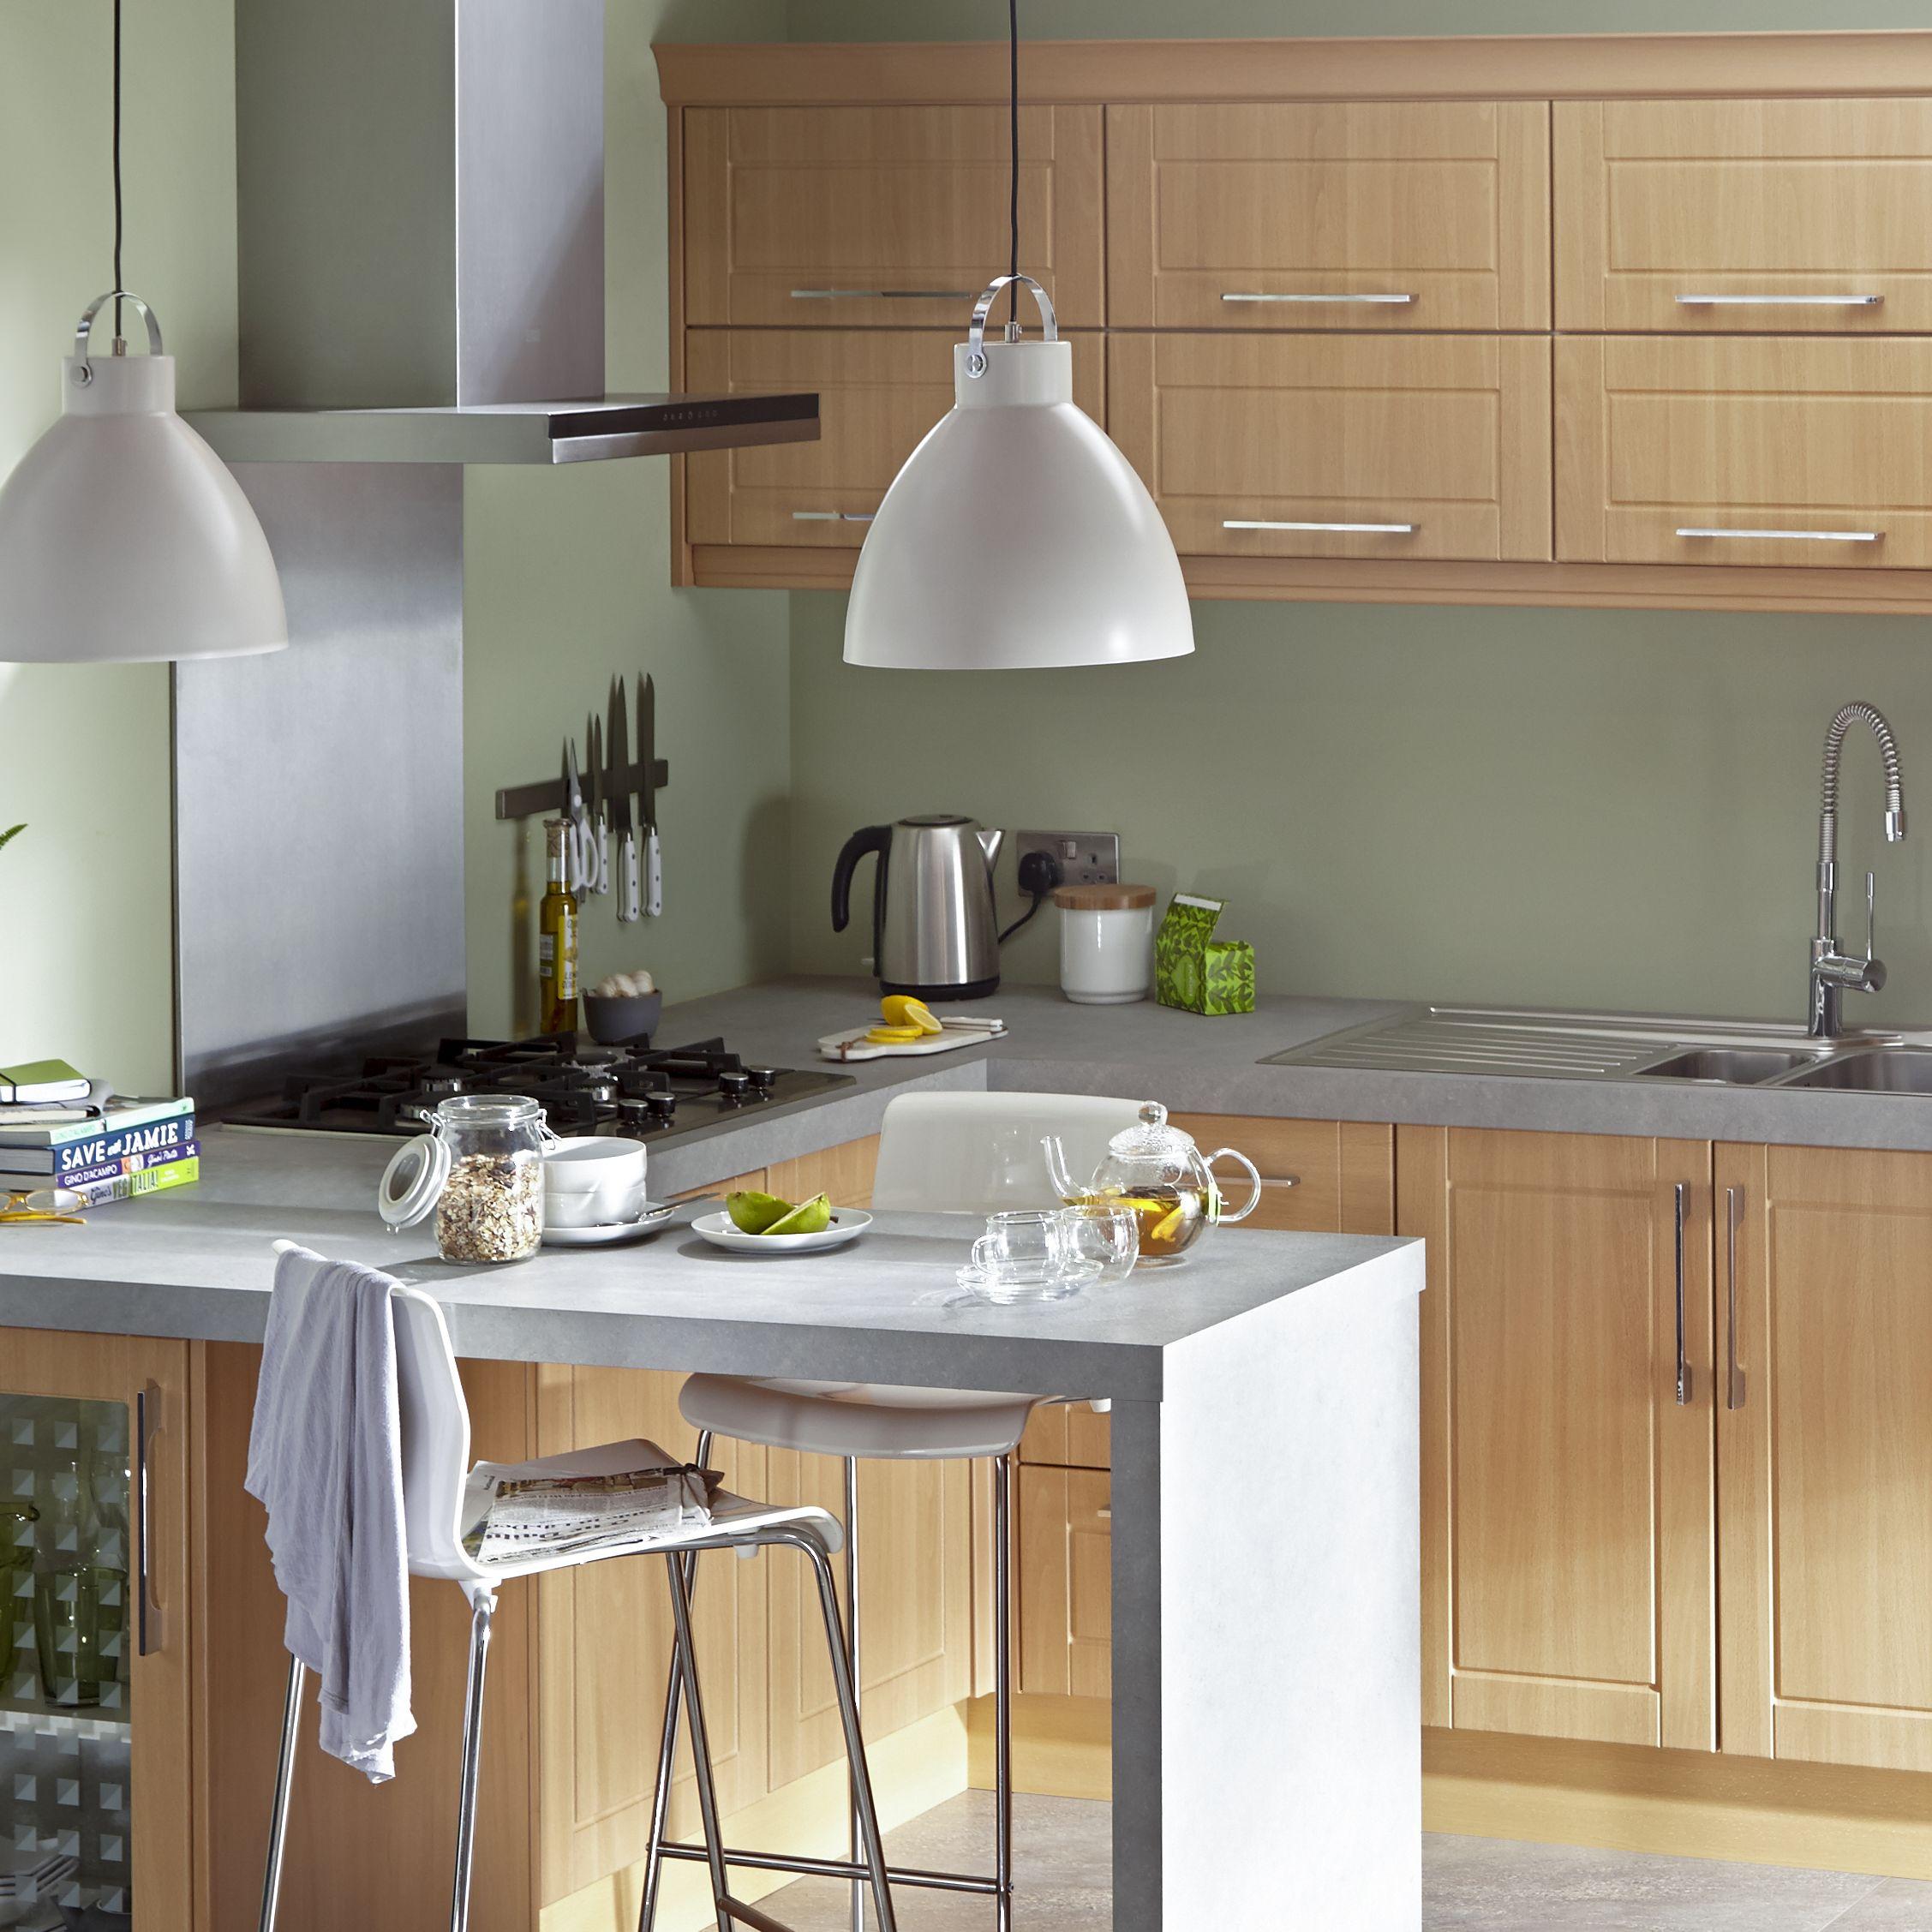 Consider the kitchen